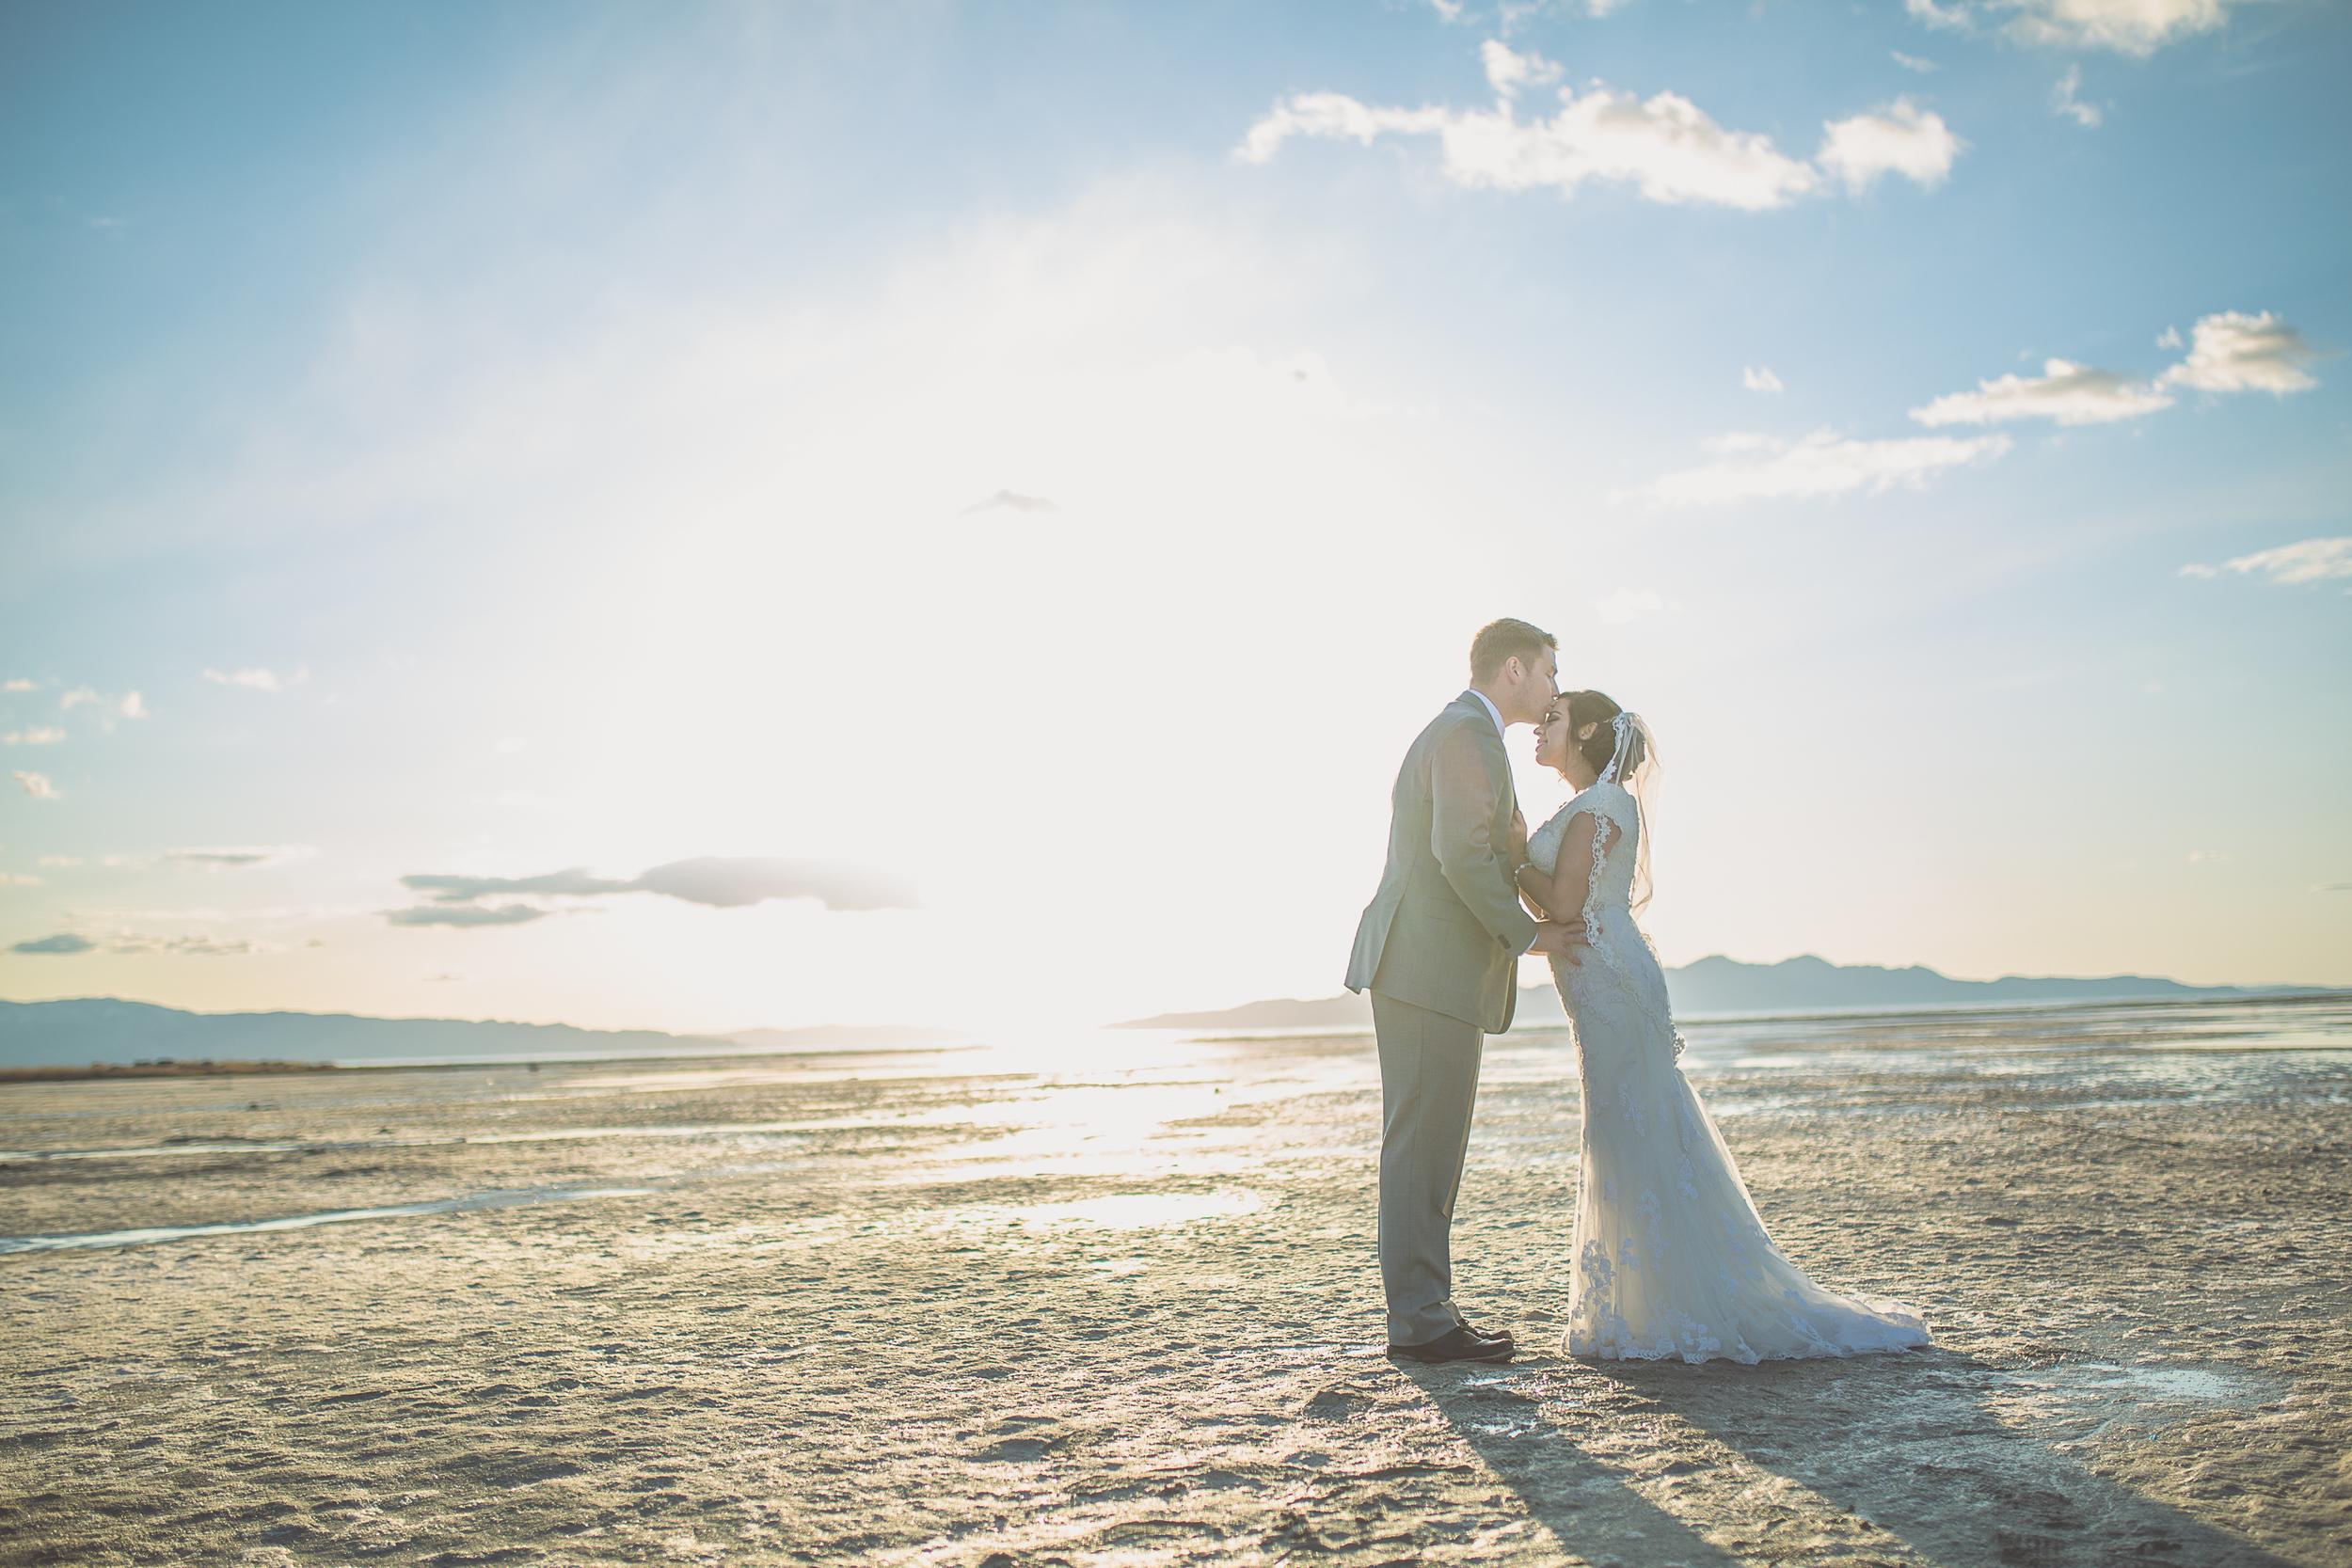 Tyler-Shearer-Photography-Loren-Jovanne-Proof-Edits-Wedding-1153.jpg